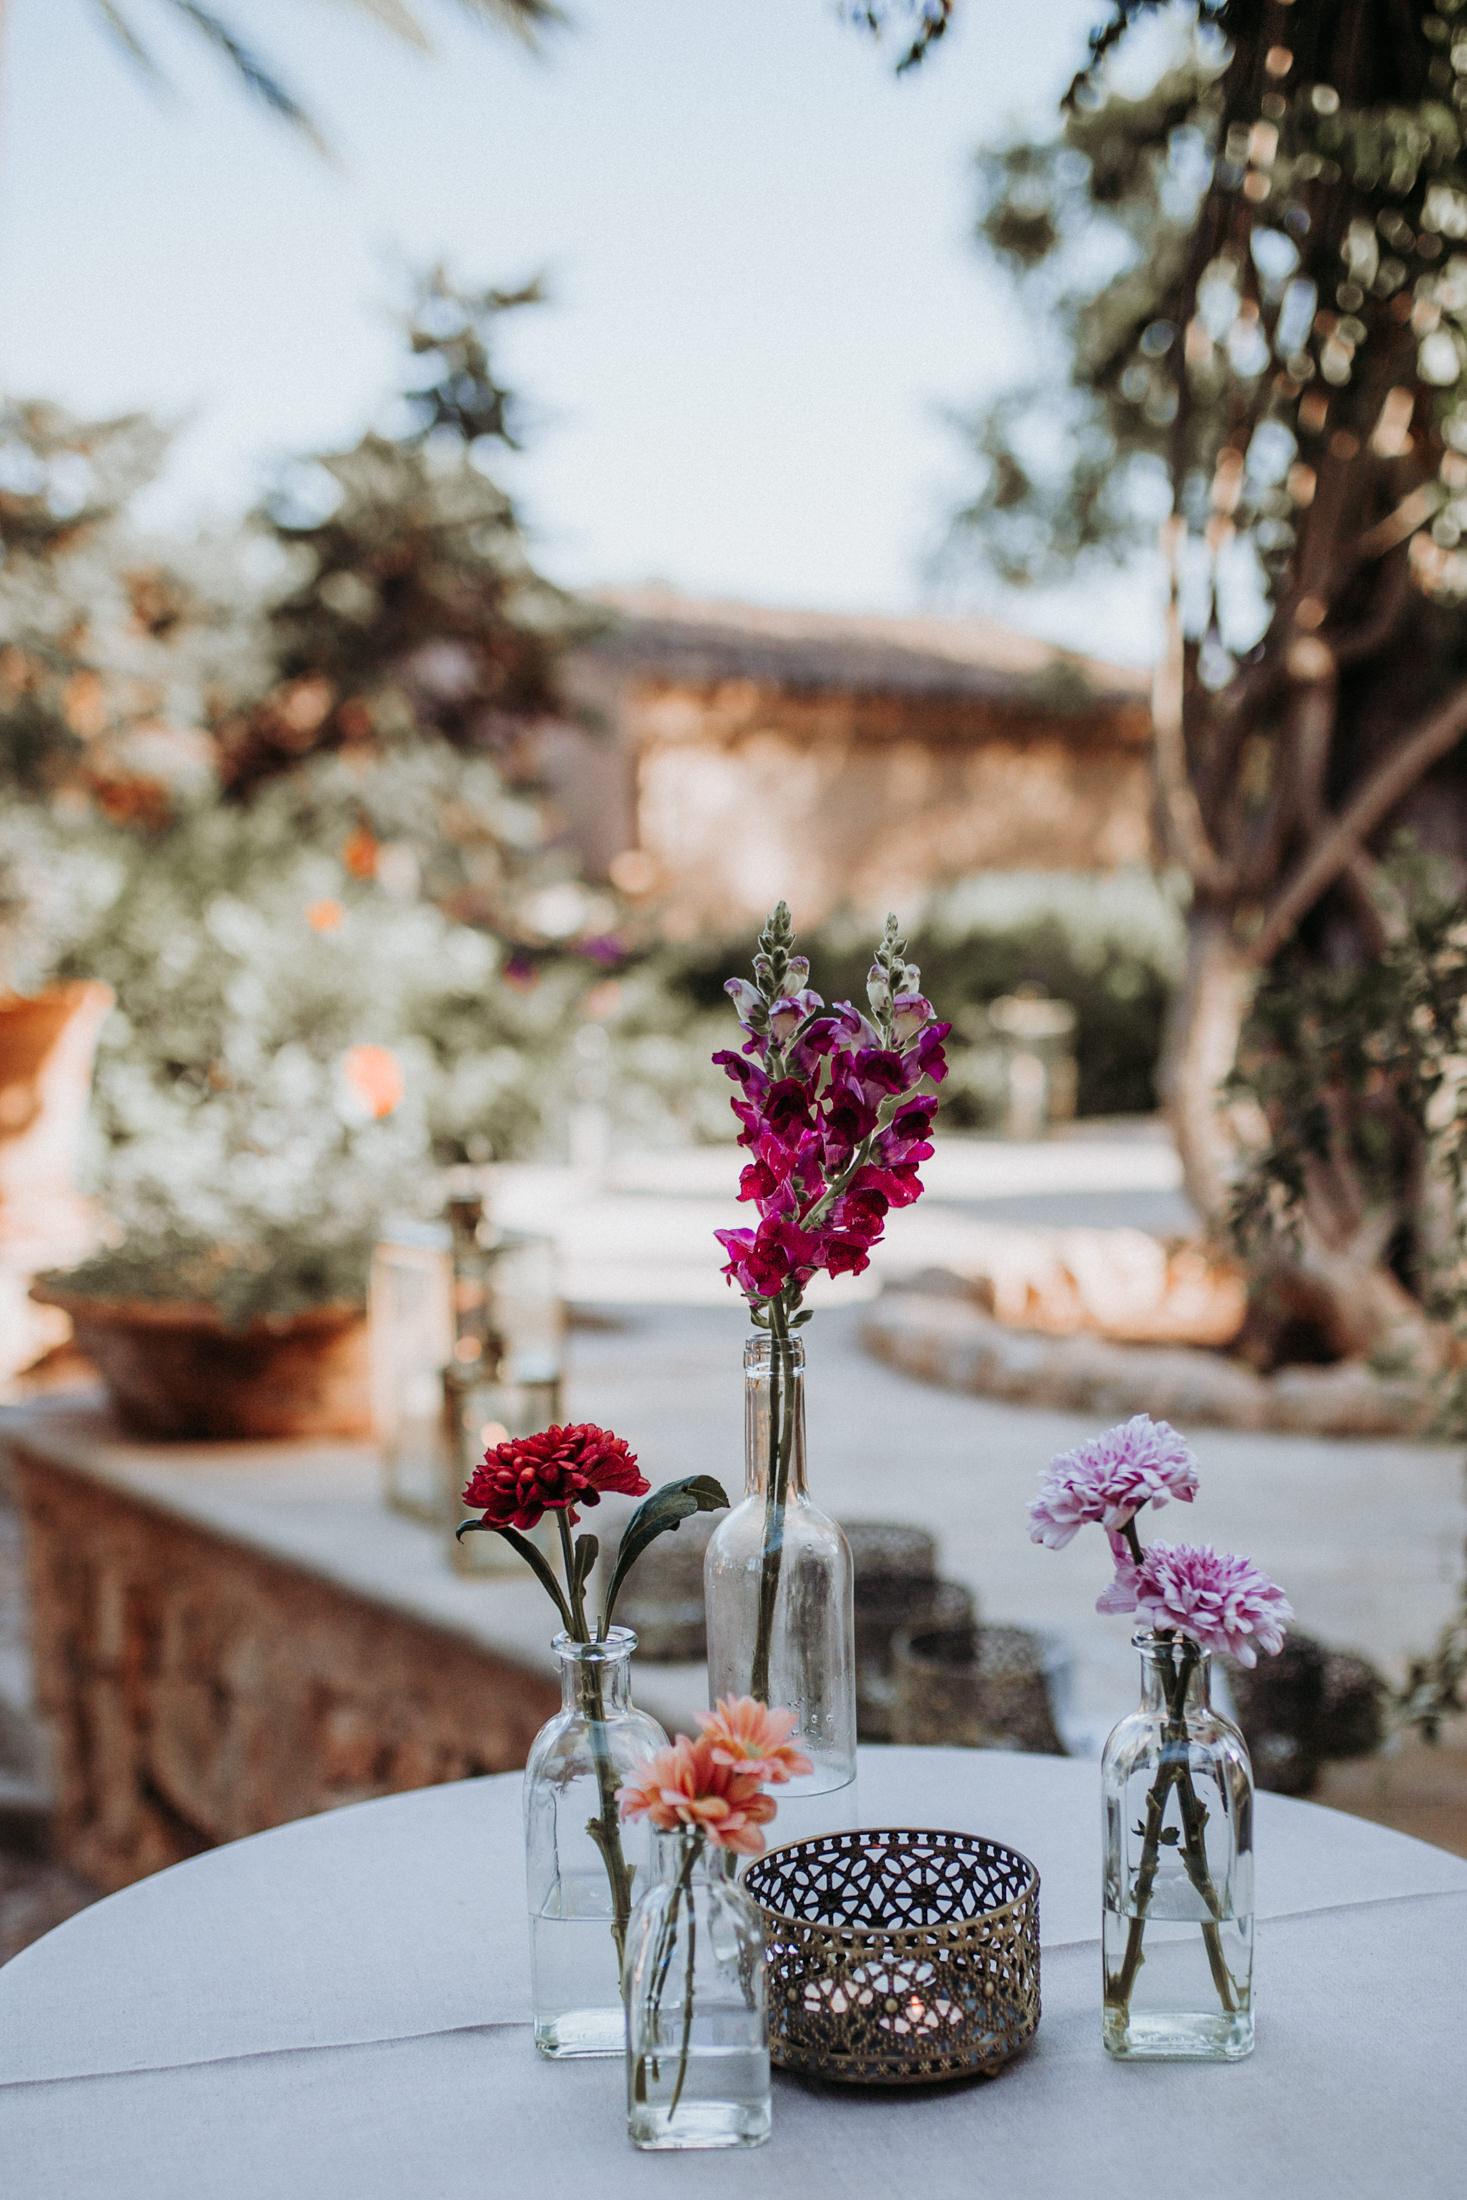 Wedding_Photographer_Mallorca_Daniela-Marquardt_Photography_New_York_Iceland_Tuscany_Santorini_Portugal_Austria_Bavaria_Elopement_Hochzeitsfotograf_AntjeRajat1_33